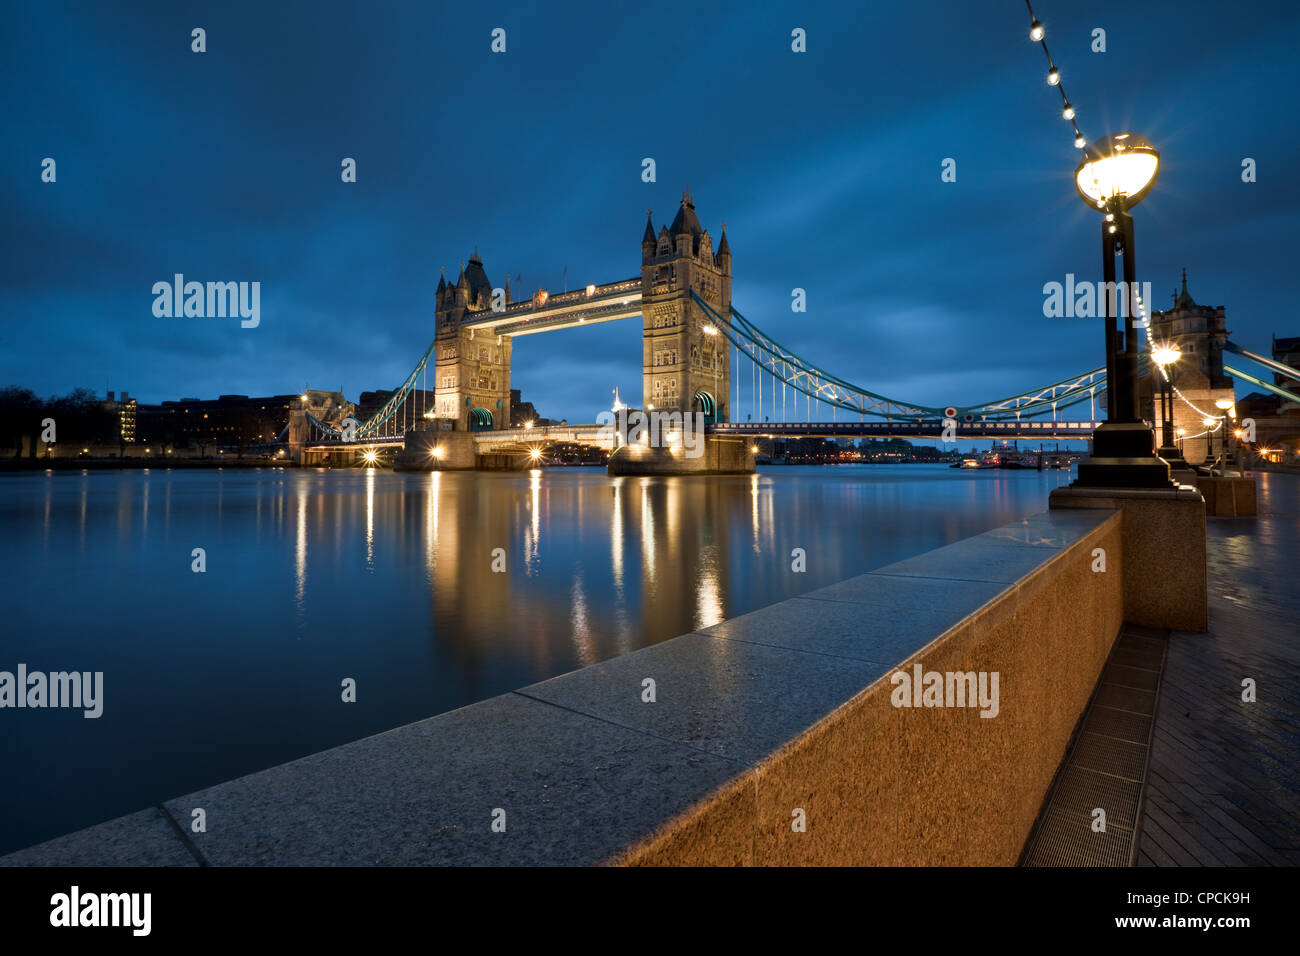 Night lights queens walk london - Tower Bridge Seen From Queen S Walk At Night London Stock Image